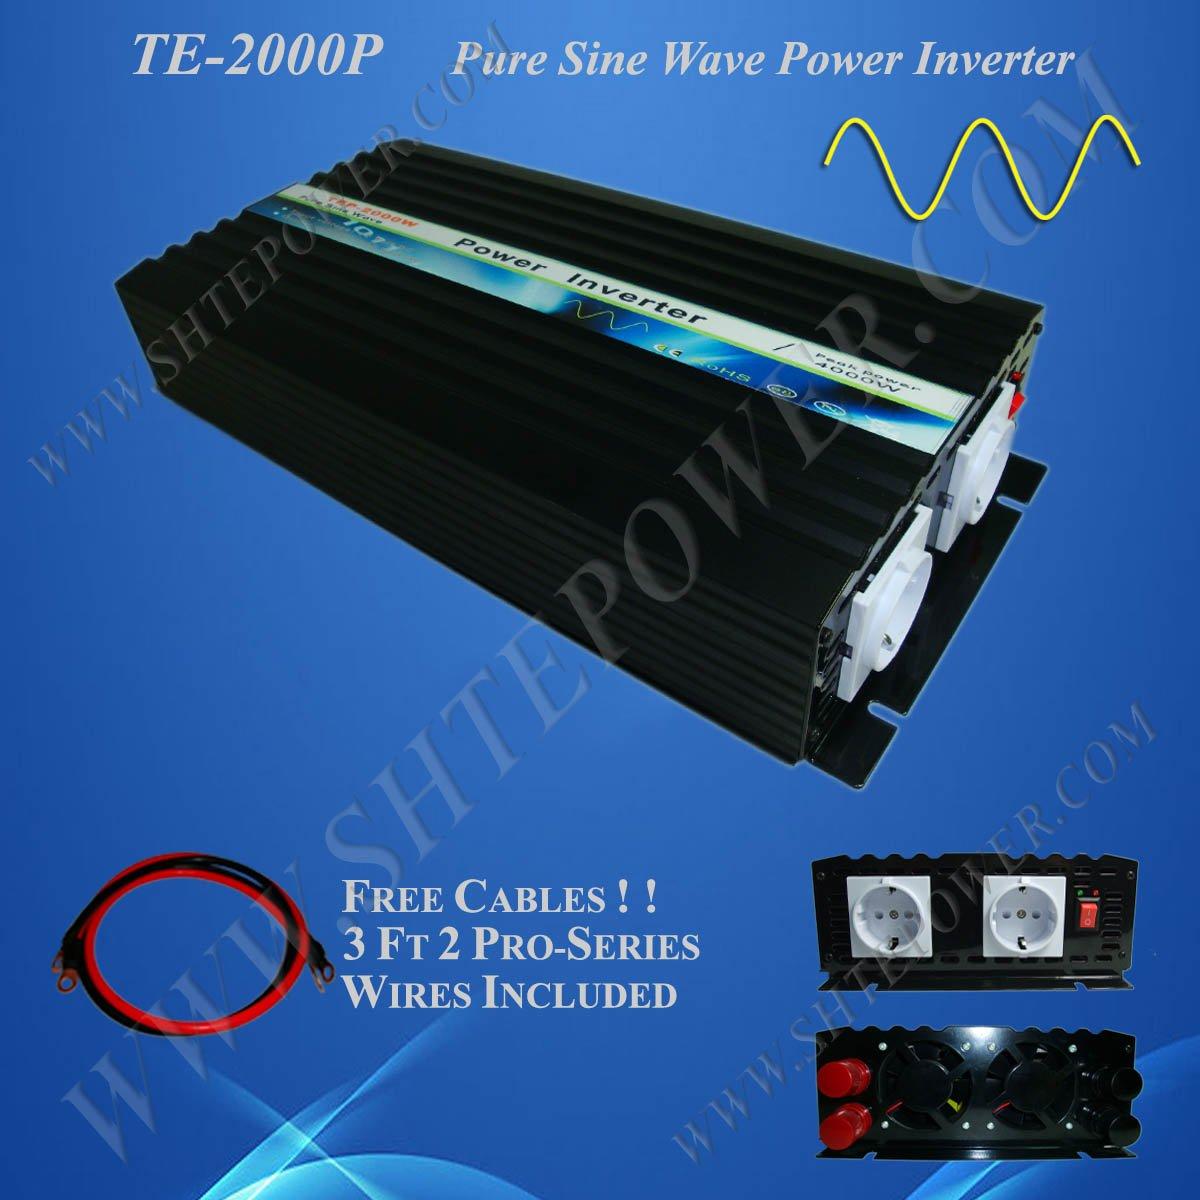 2kw off grid solar inverter 48v dc ac converter 110v/240v power inverter 48v 48v 2kw inverter for solar systems inverter 48 volt inverter 220v 2kw